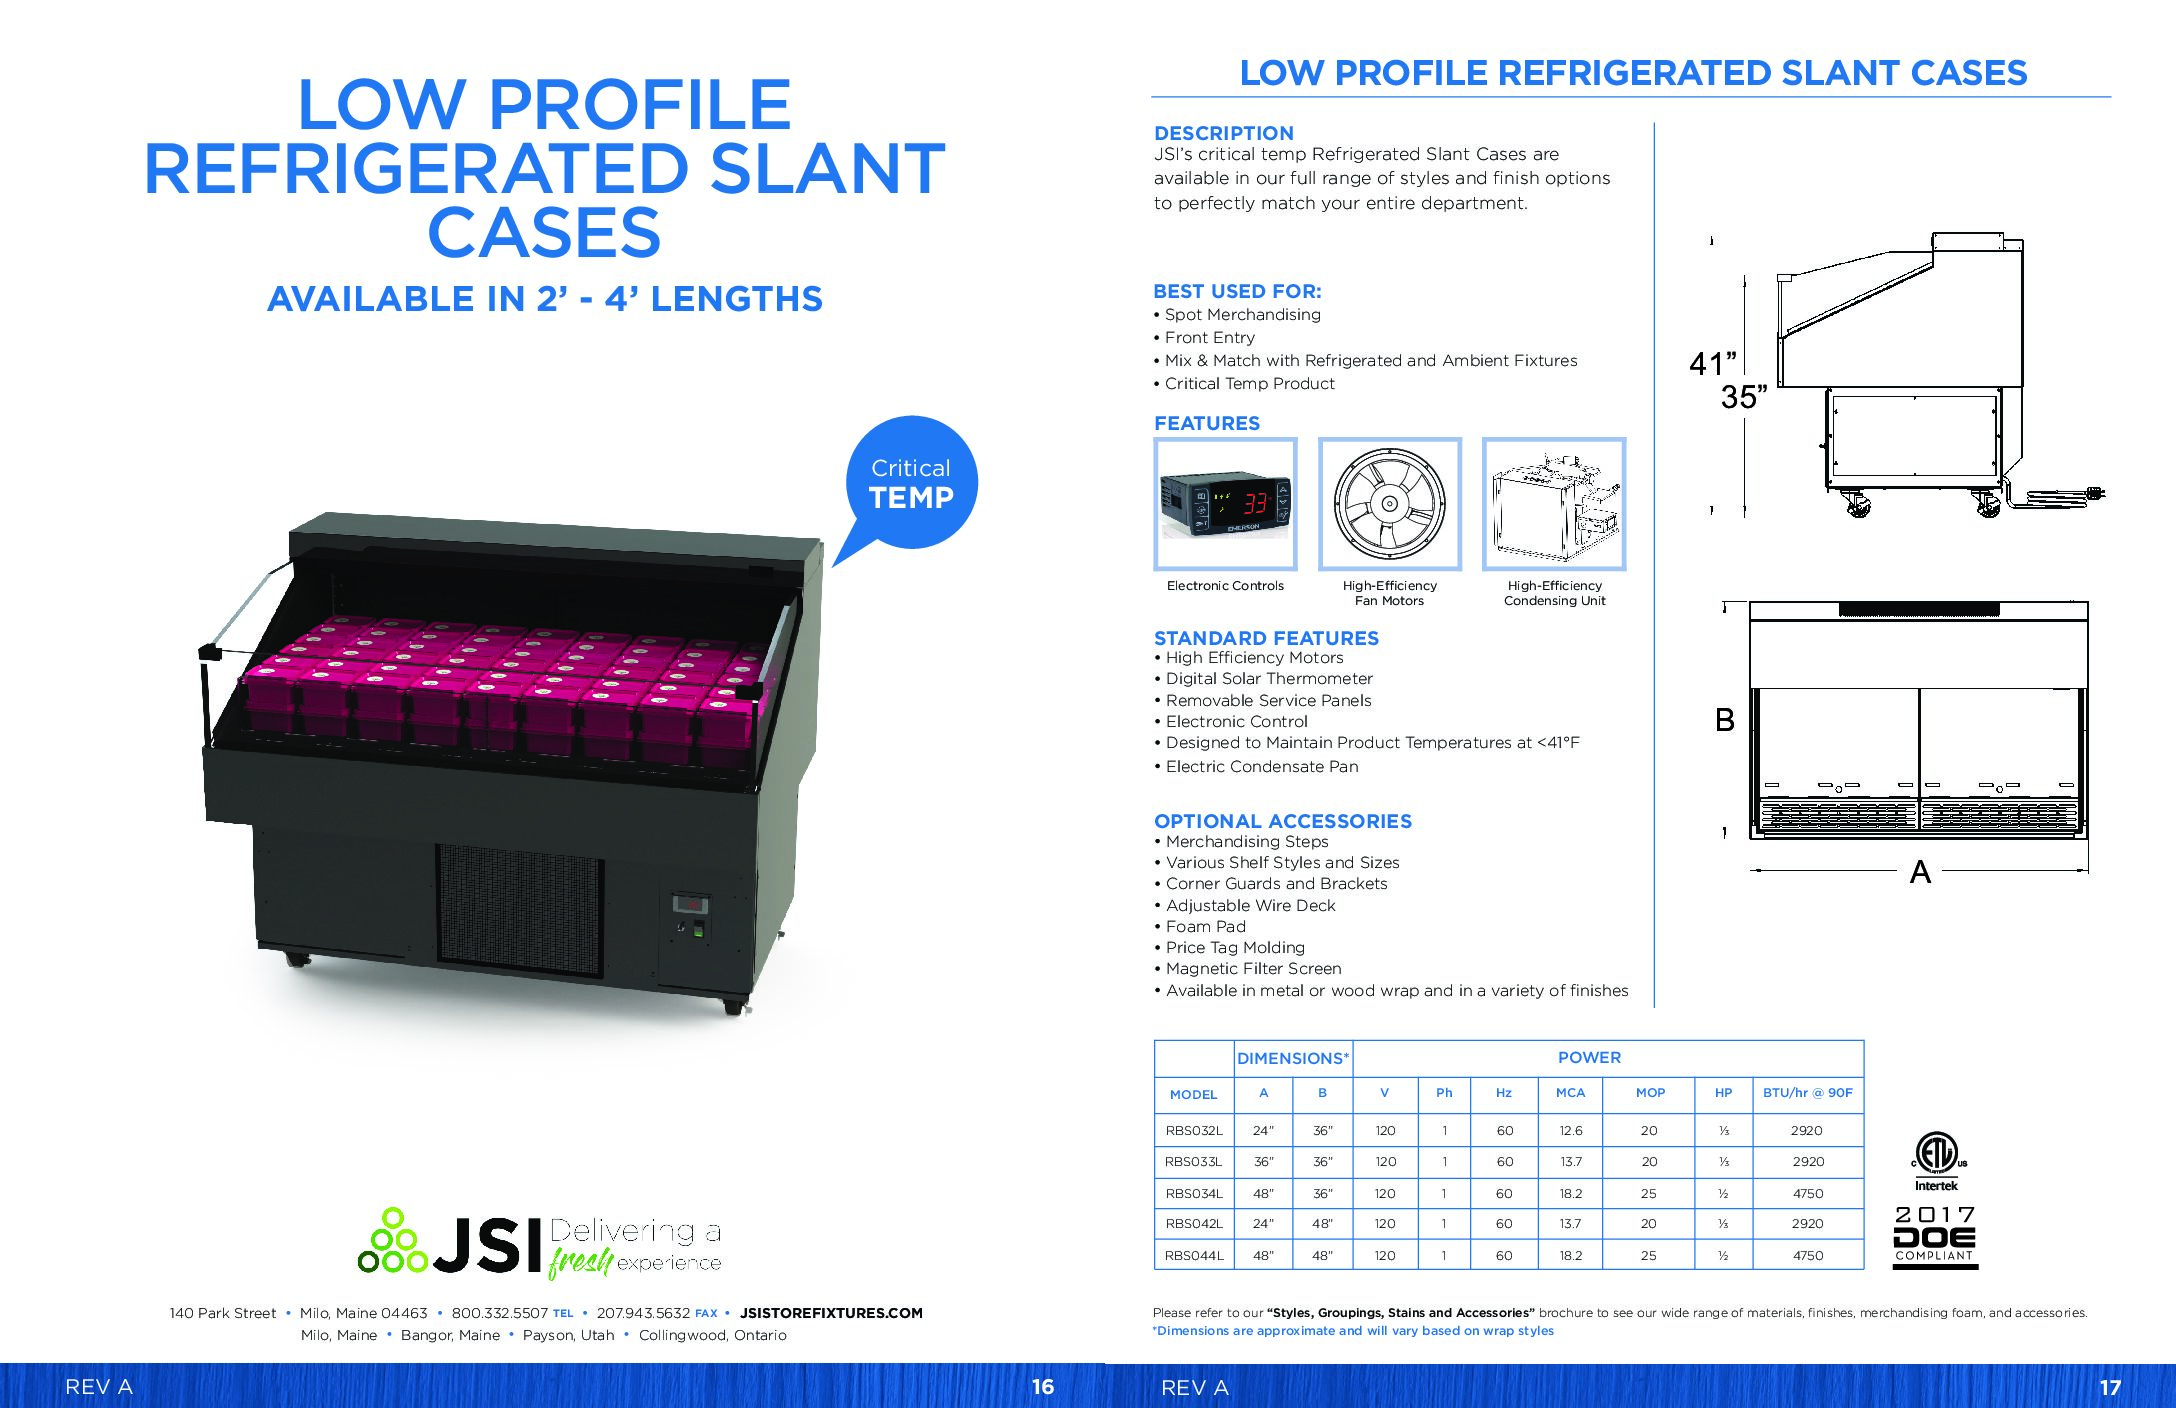 Low Profile Refrigerated Slant Cases (2'-4'W) (PDF)